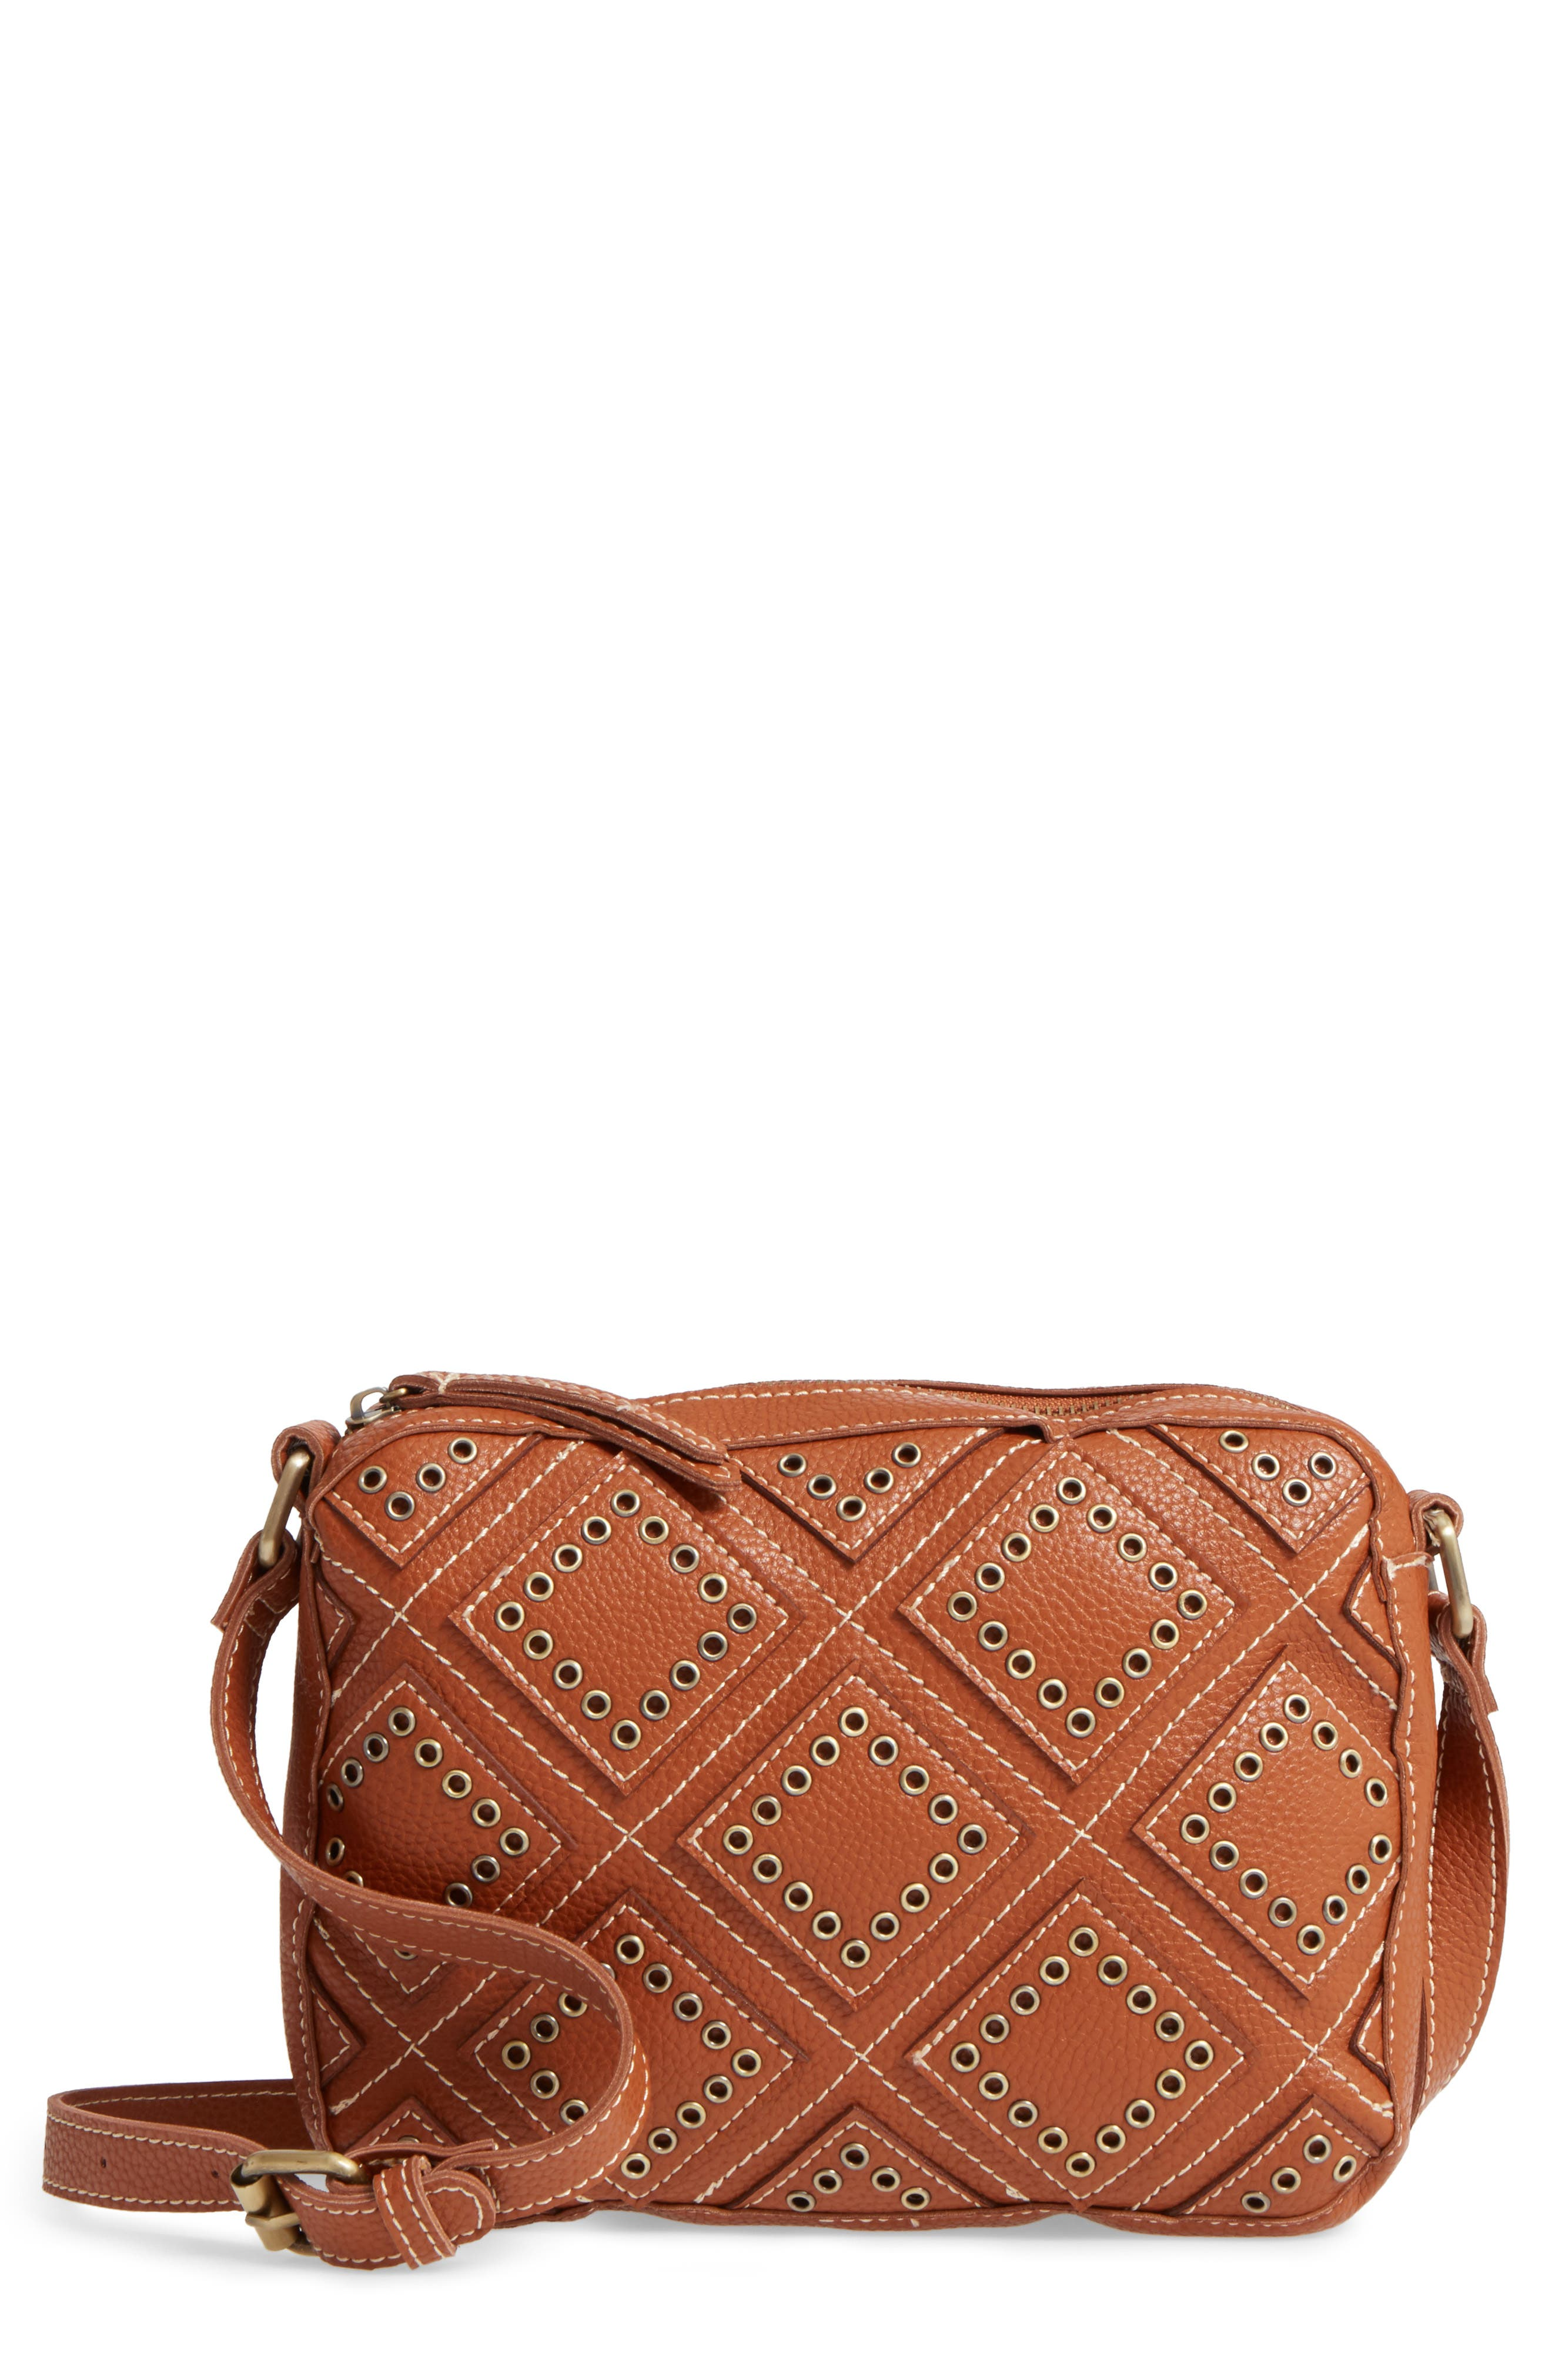 Skylar Faux Leather Crossbody Bag,                             Main thumbnail 1, color,